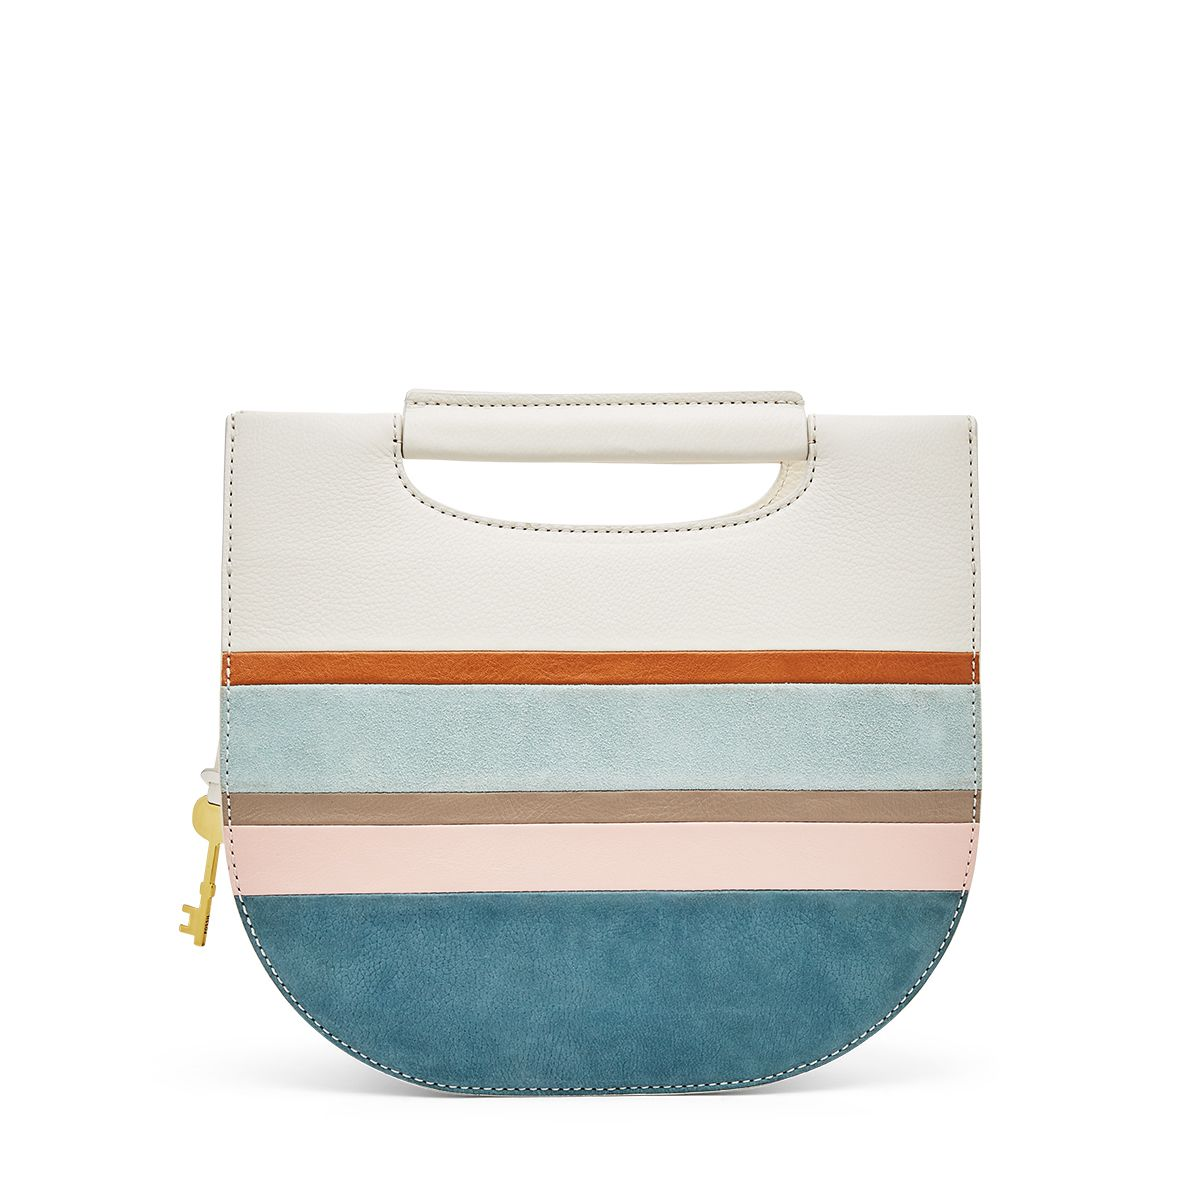 Fossil Handbags   Purses - Macy s d9dbb42ada